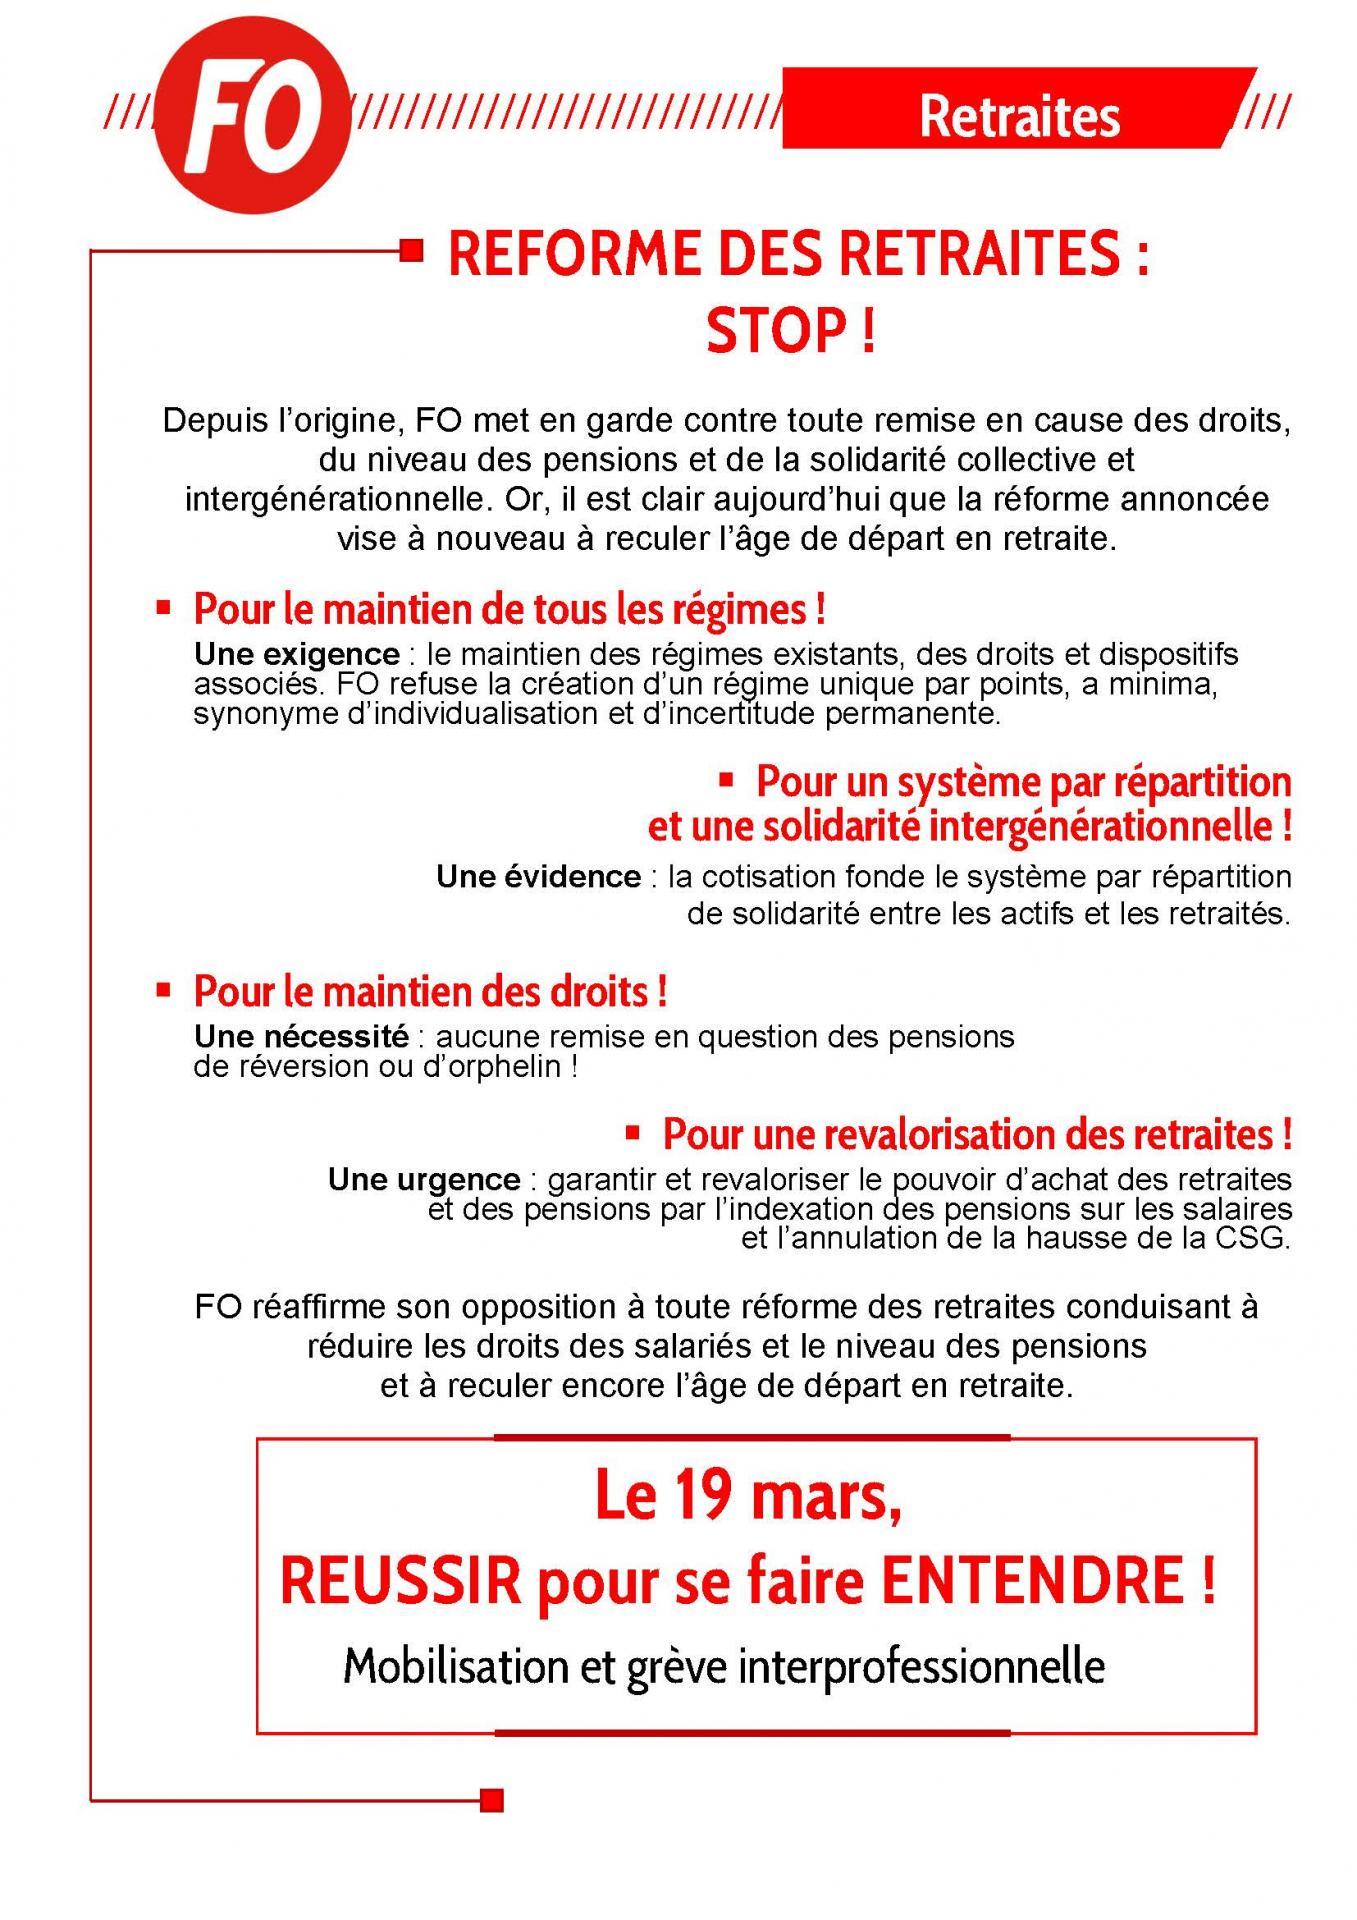 Tract reforme des retraites 19 mars